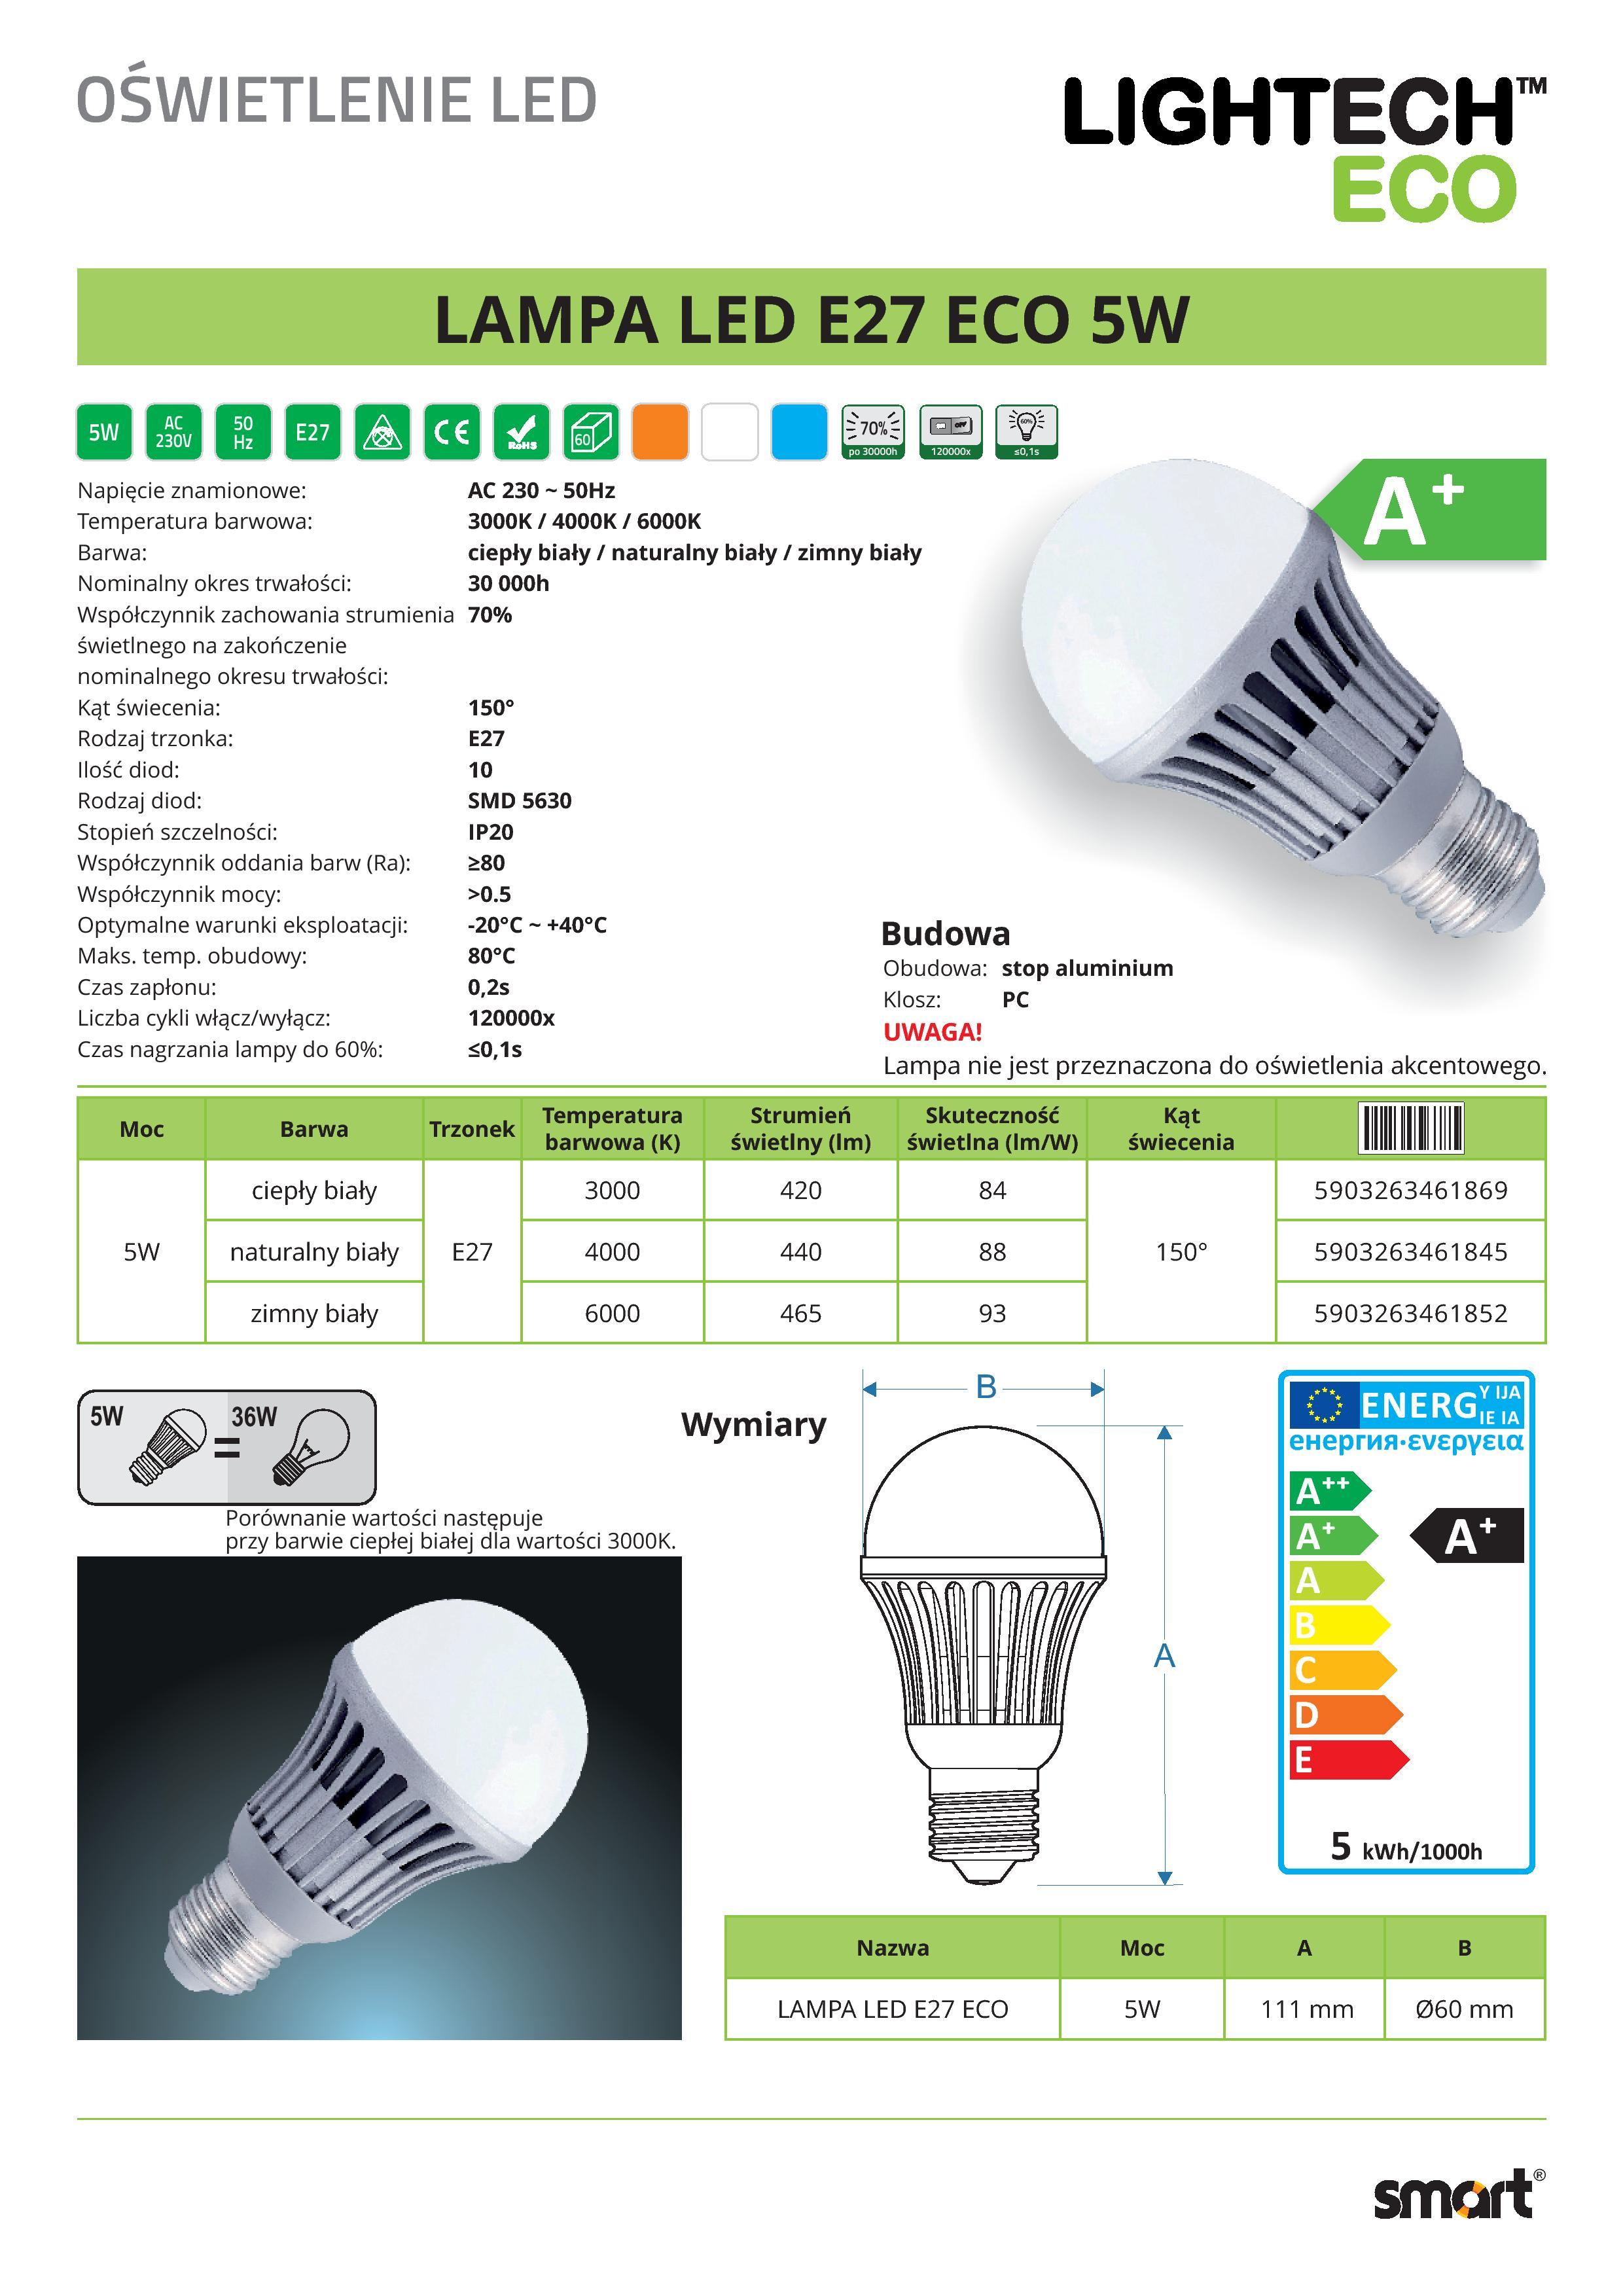 LAMPA_LED_E27_ECO_5W-page-001 Faszinierend Led Leuchtmittel E27 10w Dekorationen